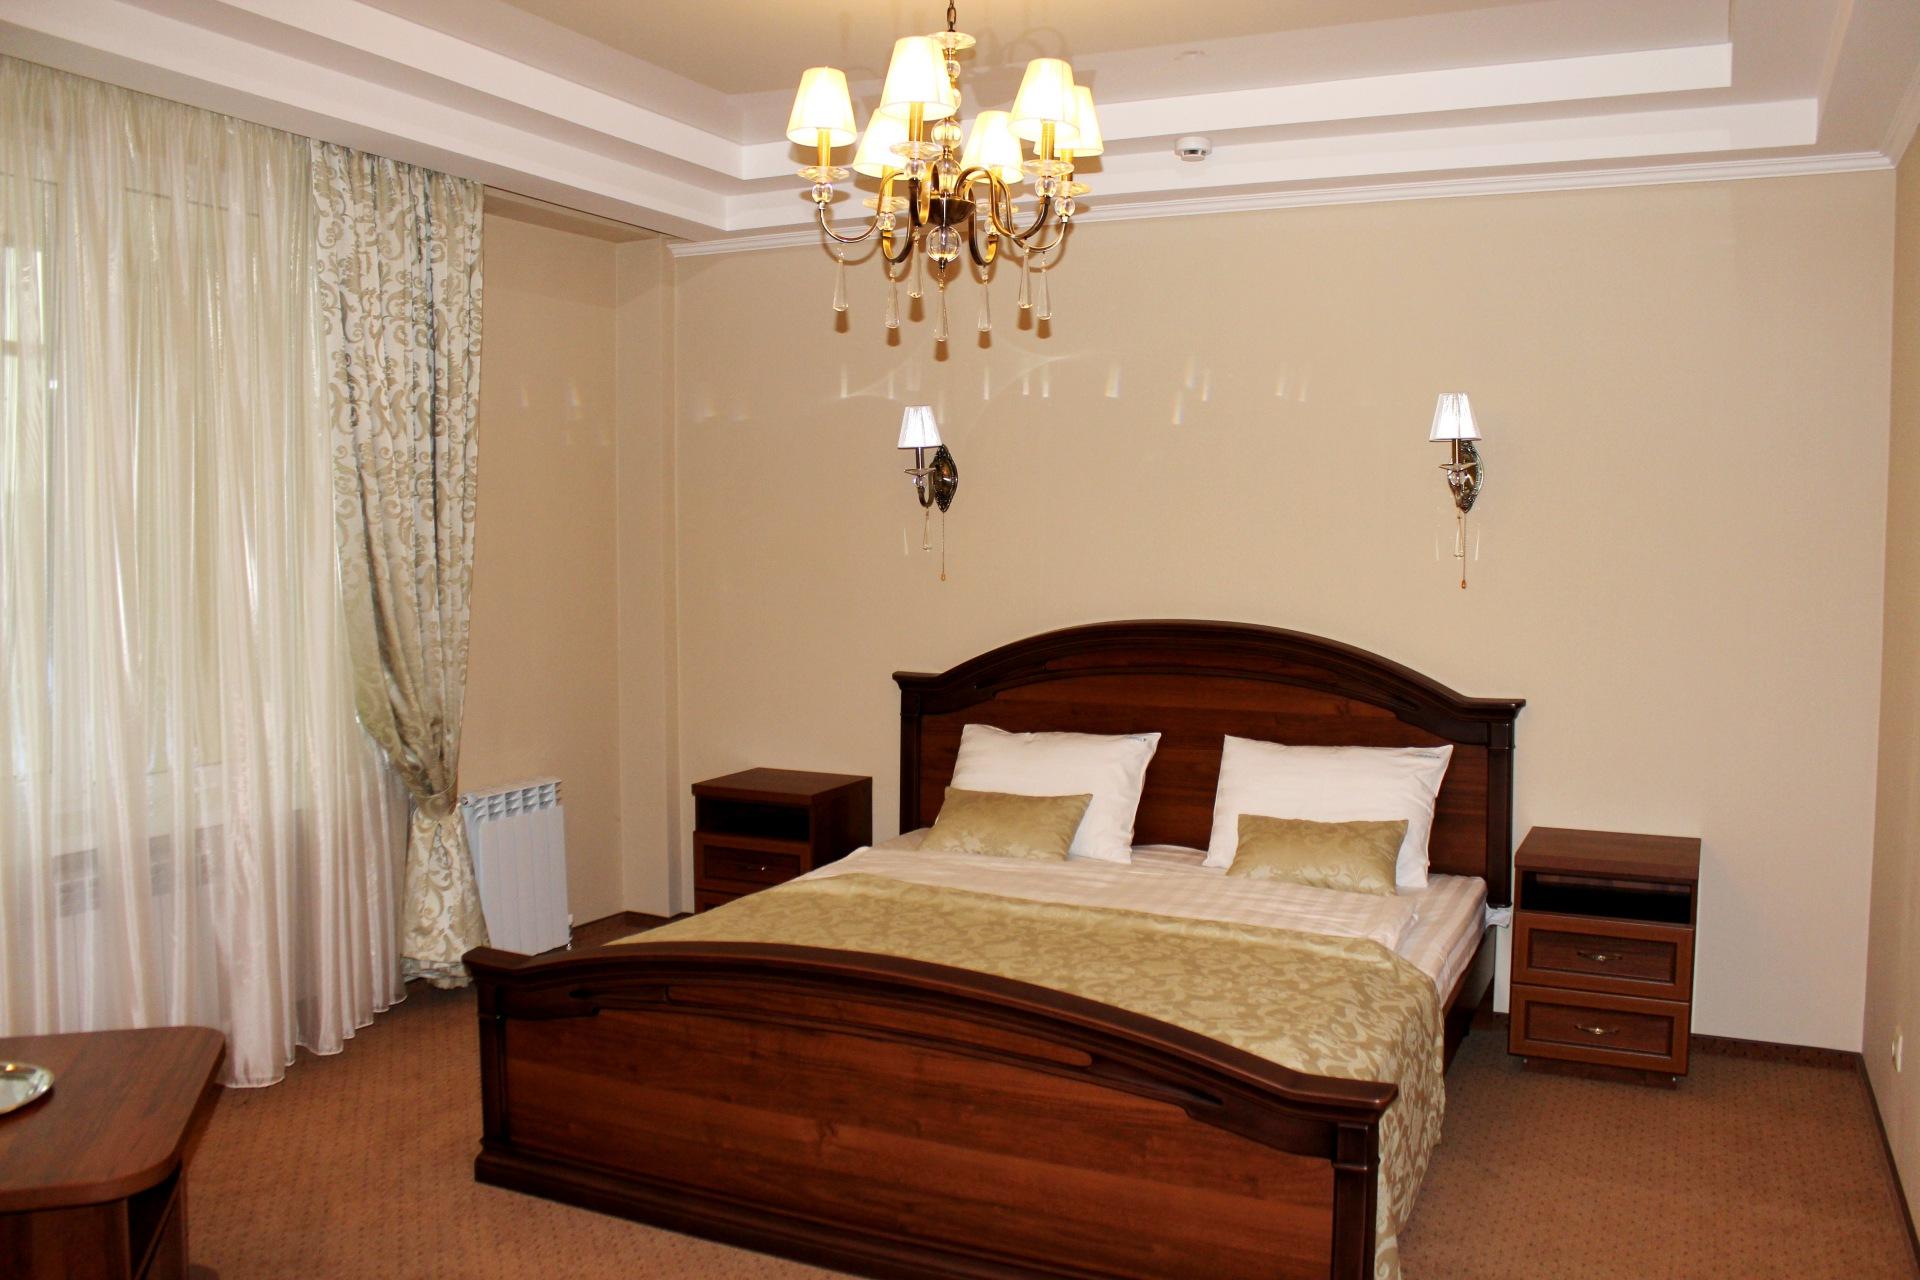 Краснодар гостиницу 500 рублей 3 фотография